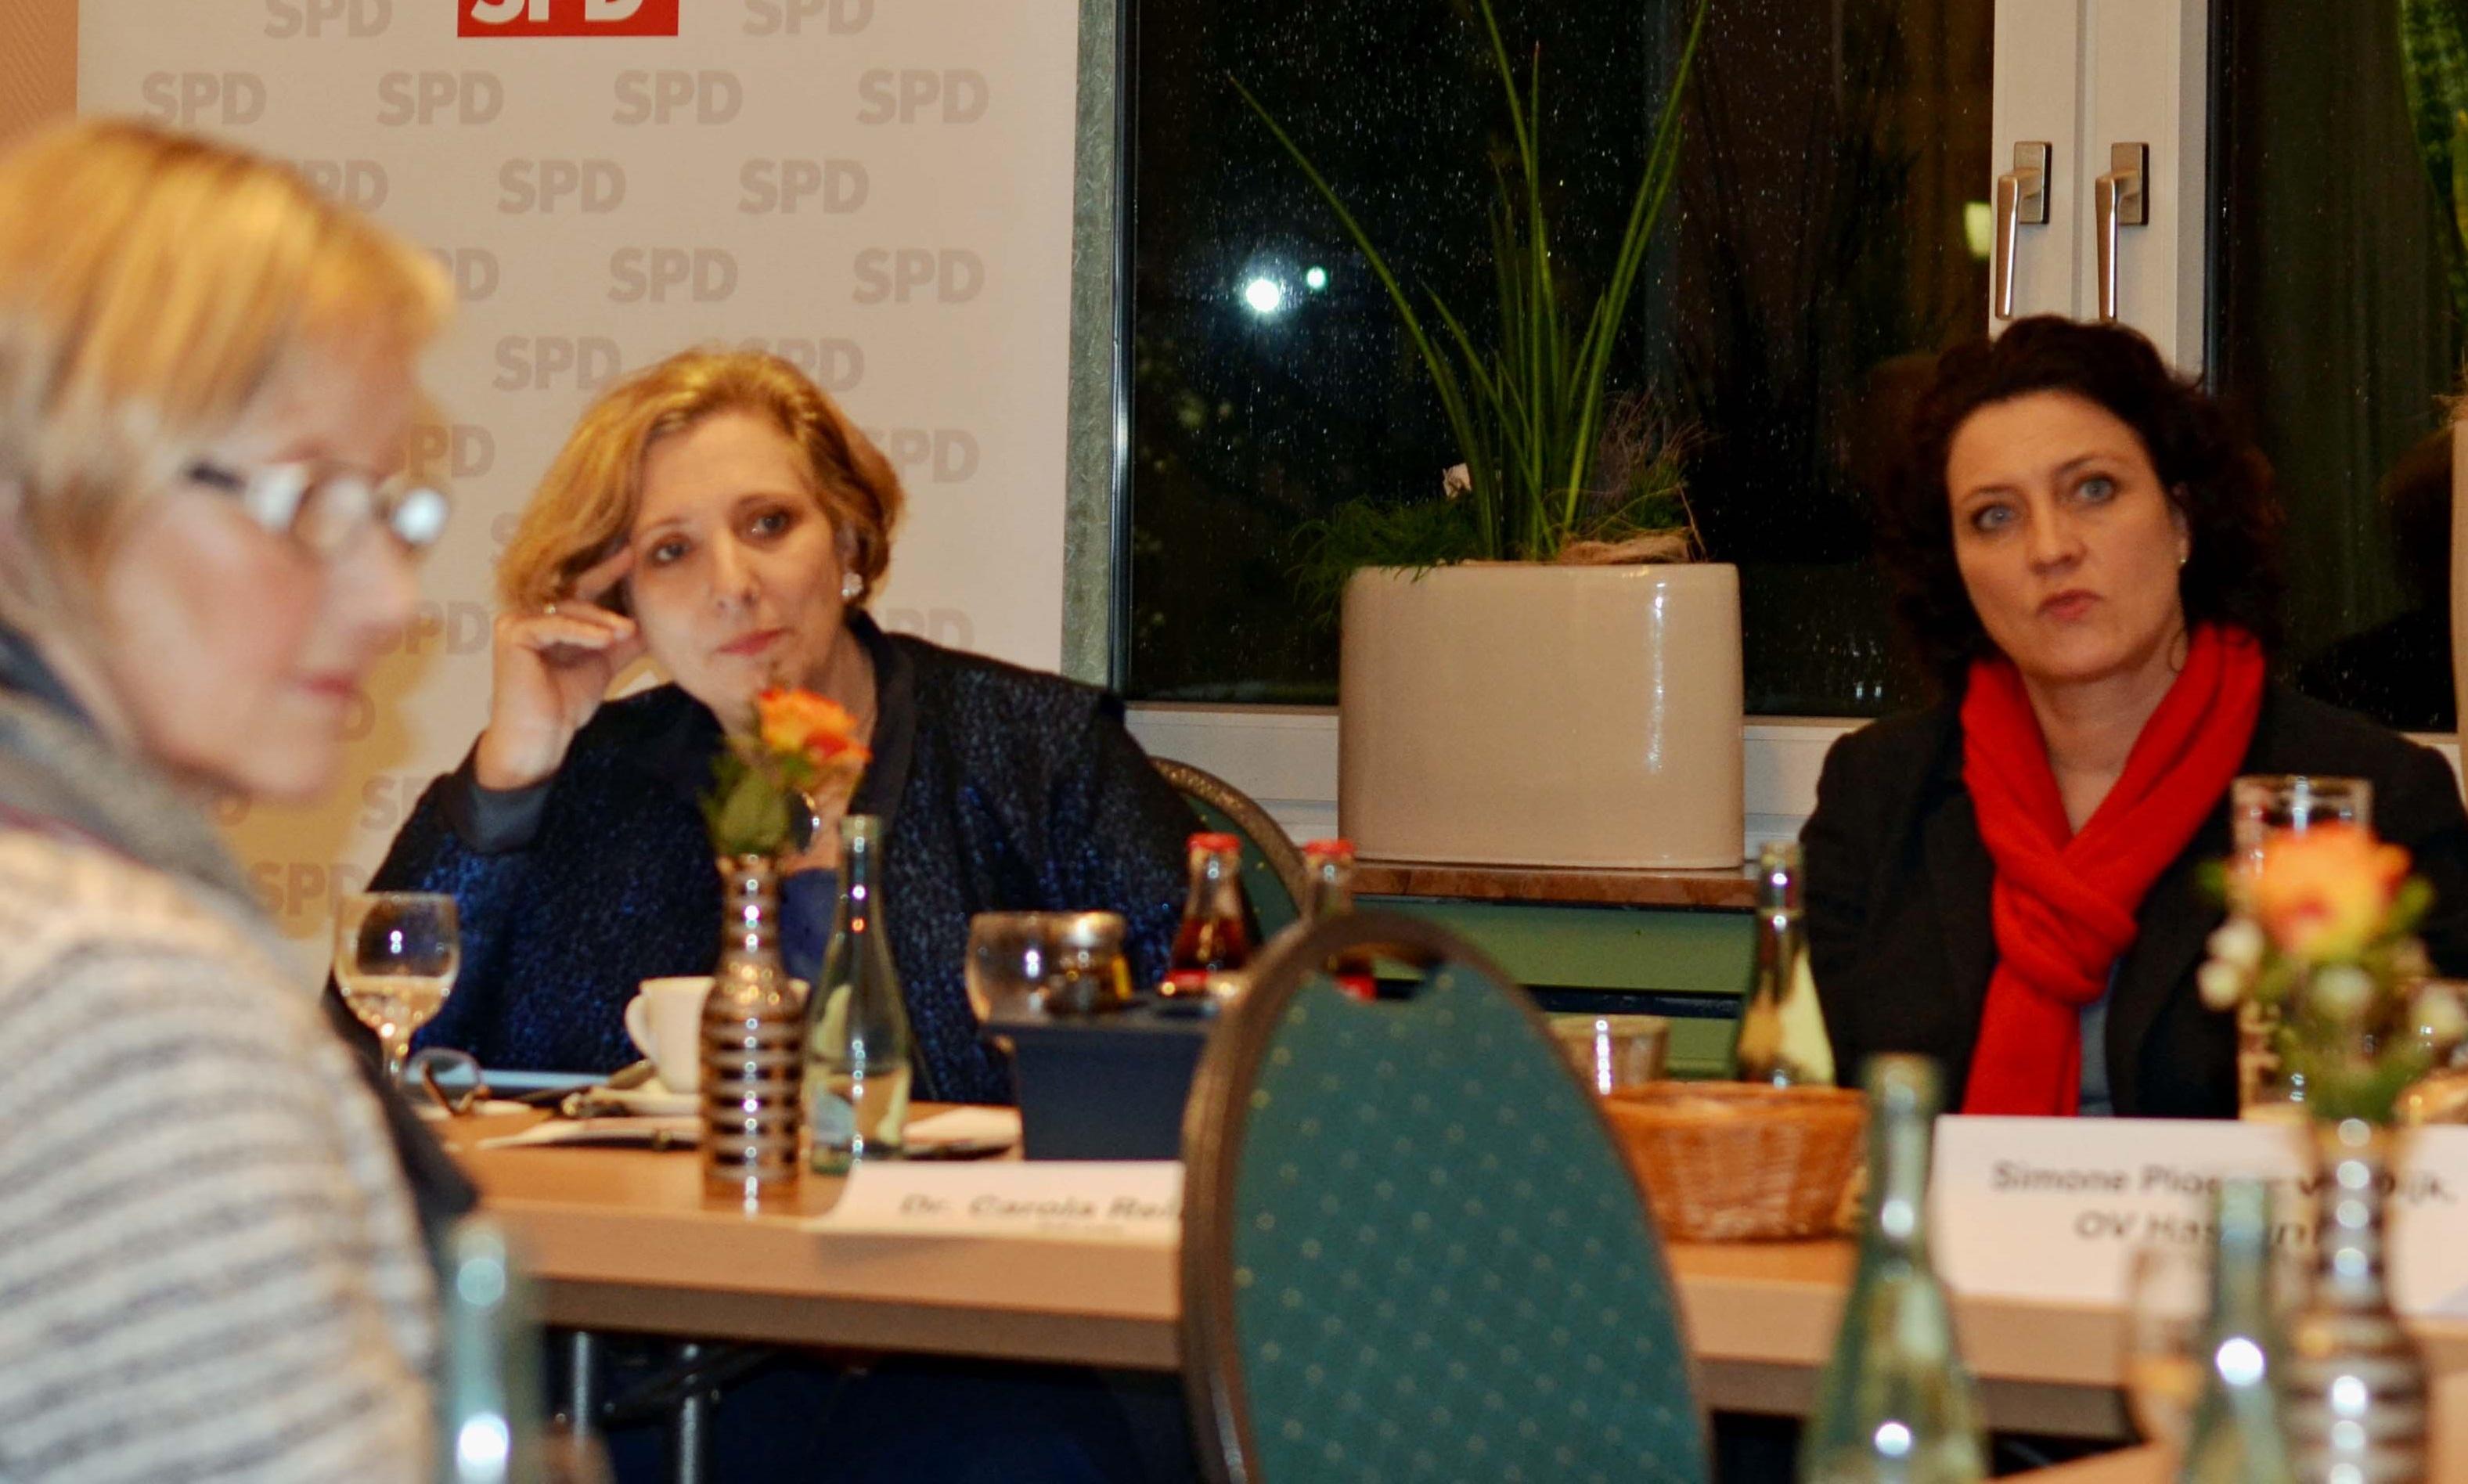 Dr. Daniela De Ridder und Dr. Carola Reimann